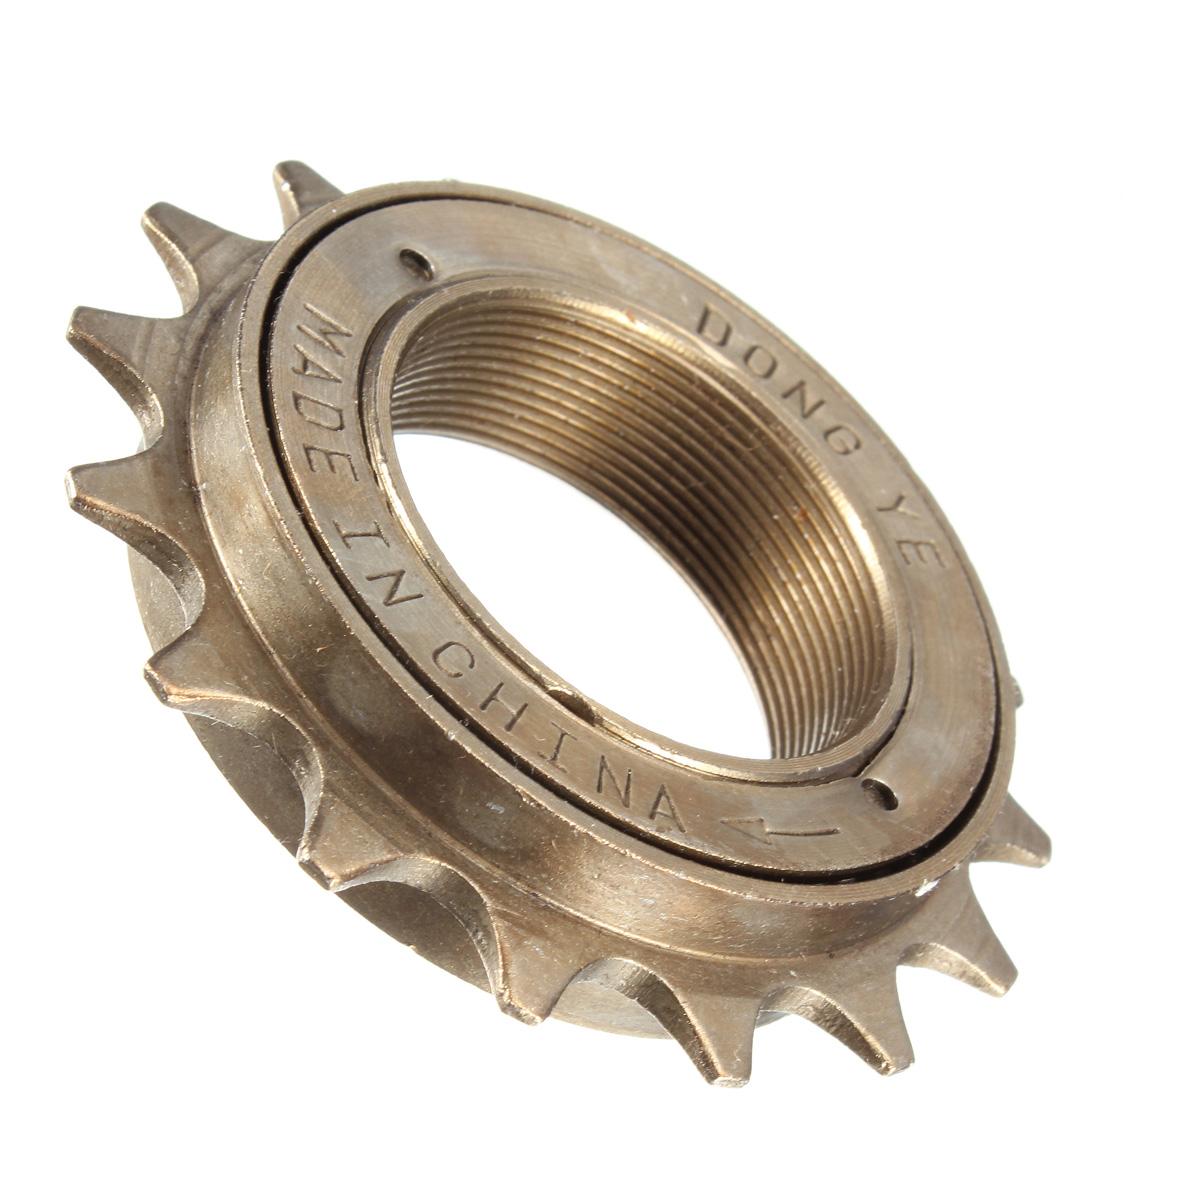 Bmx Bike Race Bicycle 16t Tooth Single Speed Freewheel